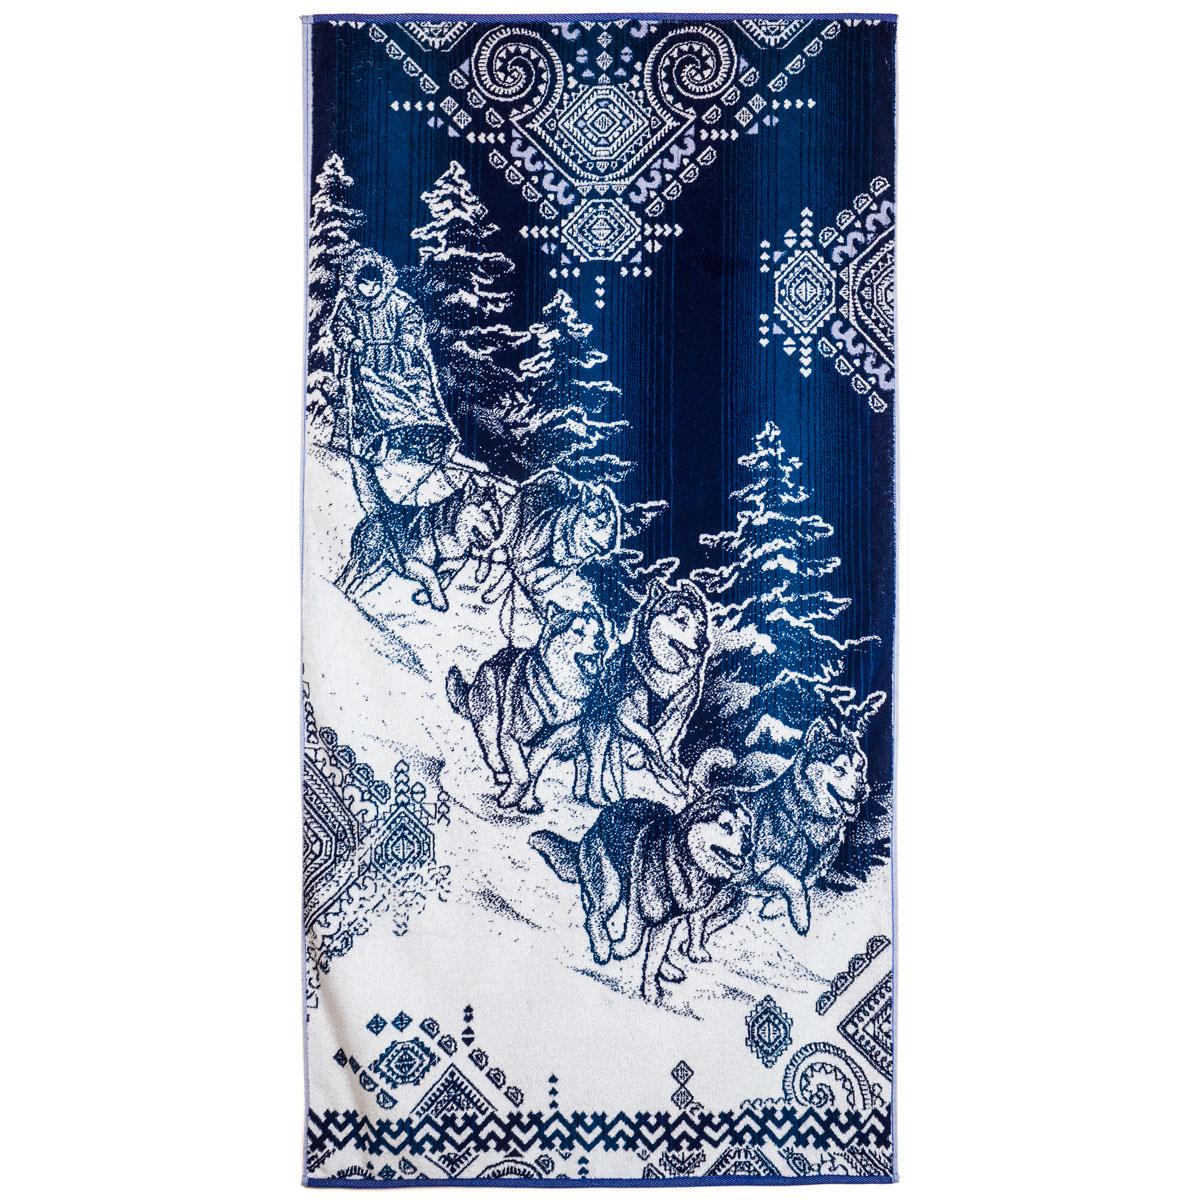 Полотенце Упряжка р. 70х140Махровые полотенца<br>Плотность ткани: 420 г/кв. м<br><br>Тип: Полотенце<br>Размер: 70х140<br>Материал: Махра